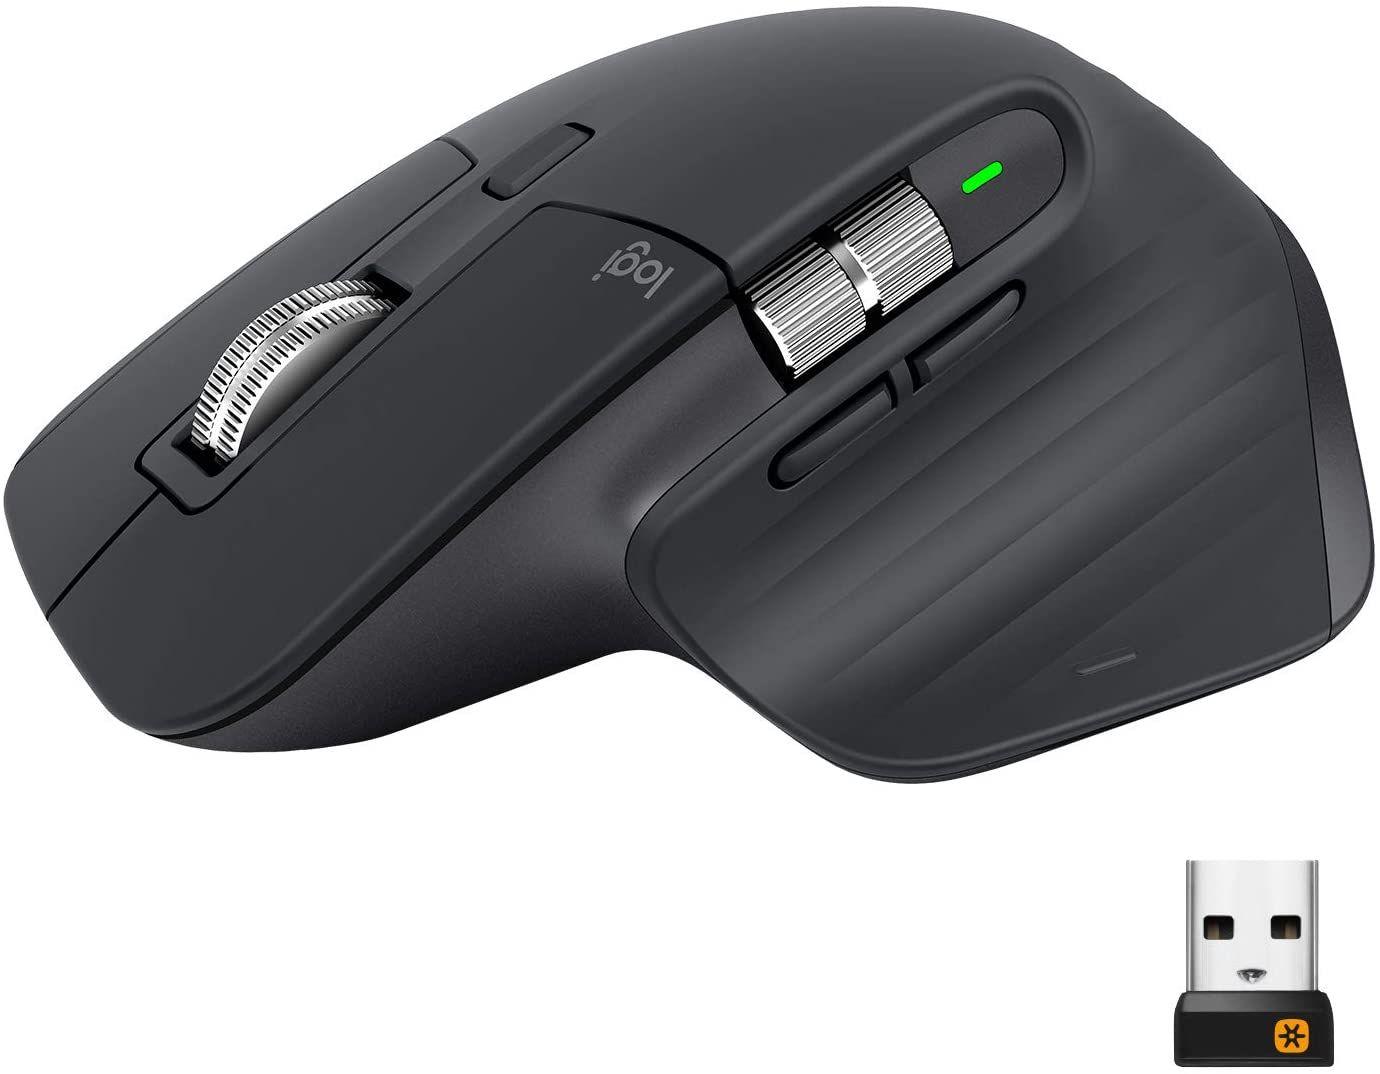 Logitech MX Master 3 - Kabellose Maus (Bluetooth, 2.4 GHz via USB-Empfänger, 4.000 DPI, Ultra-schnelles Scrollen, 7 Tasten)